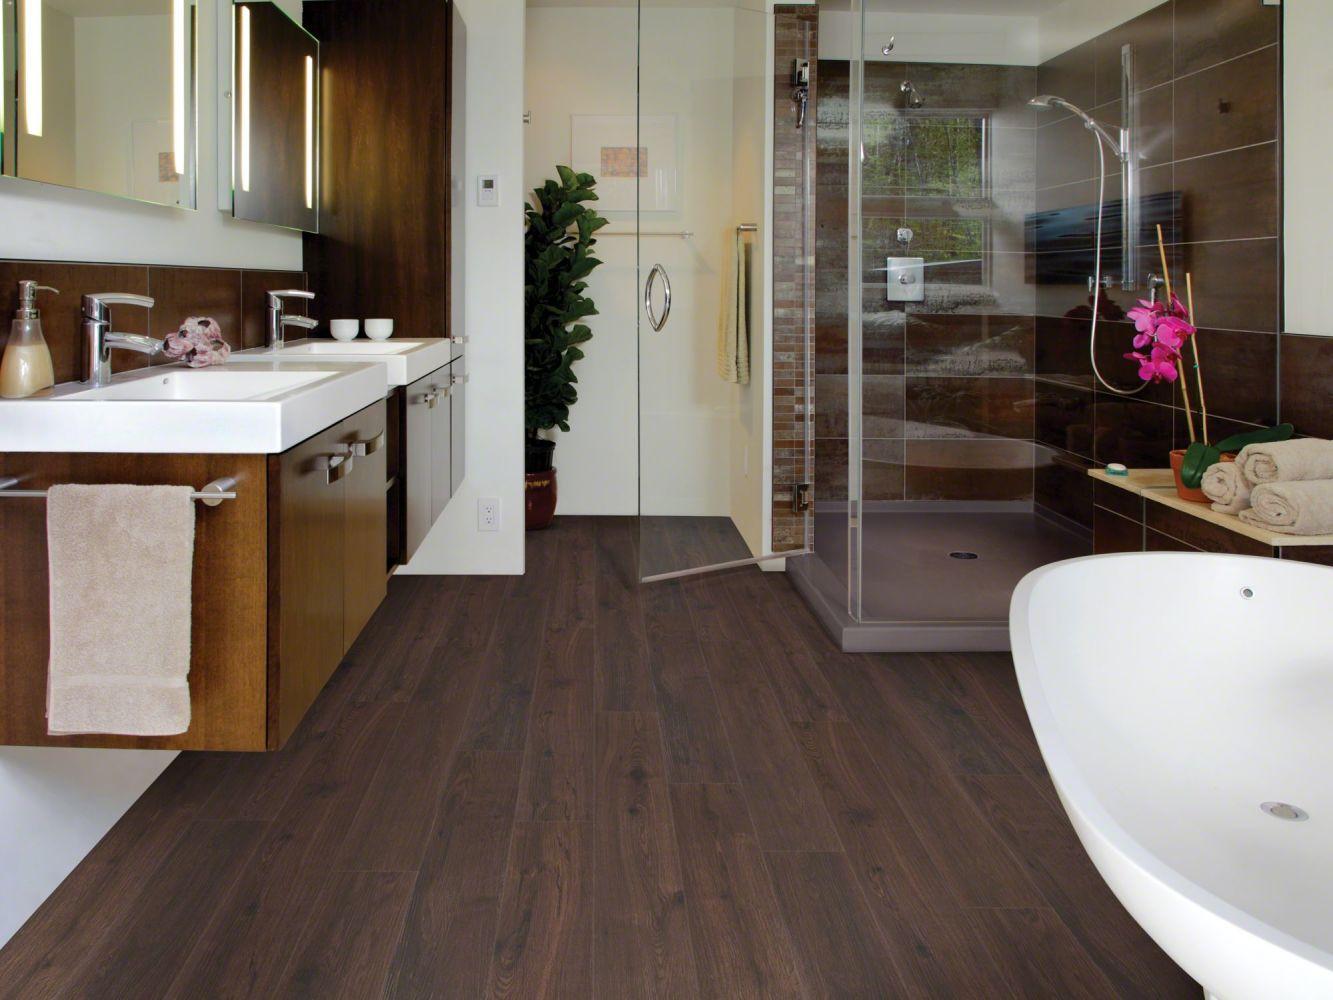 Shaw Floors Nfa HS Milan Marrone 00724_VH523